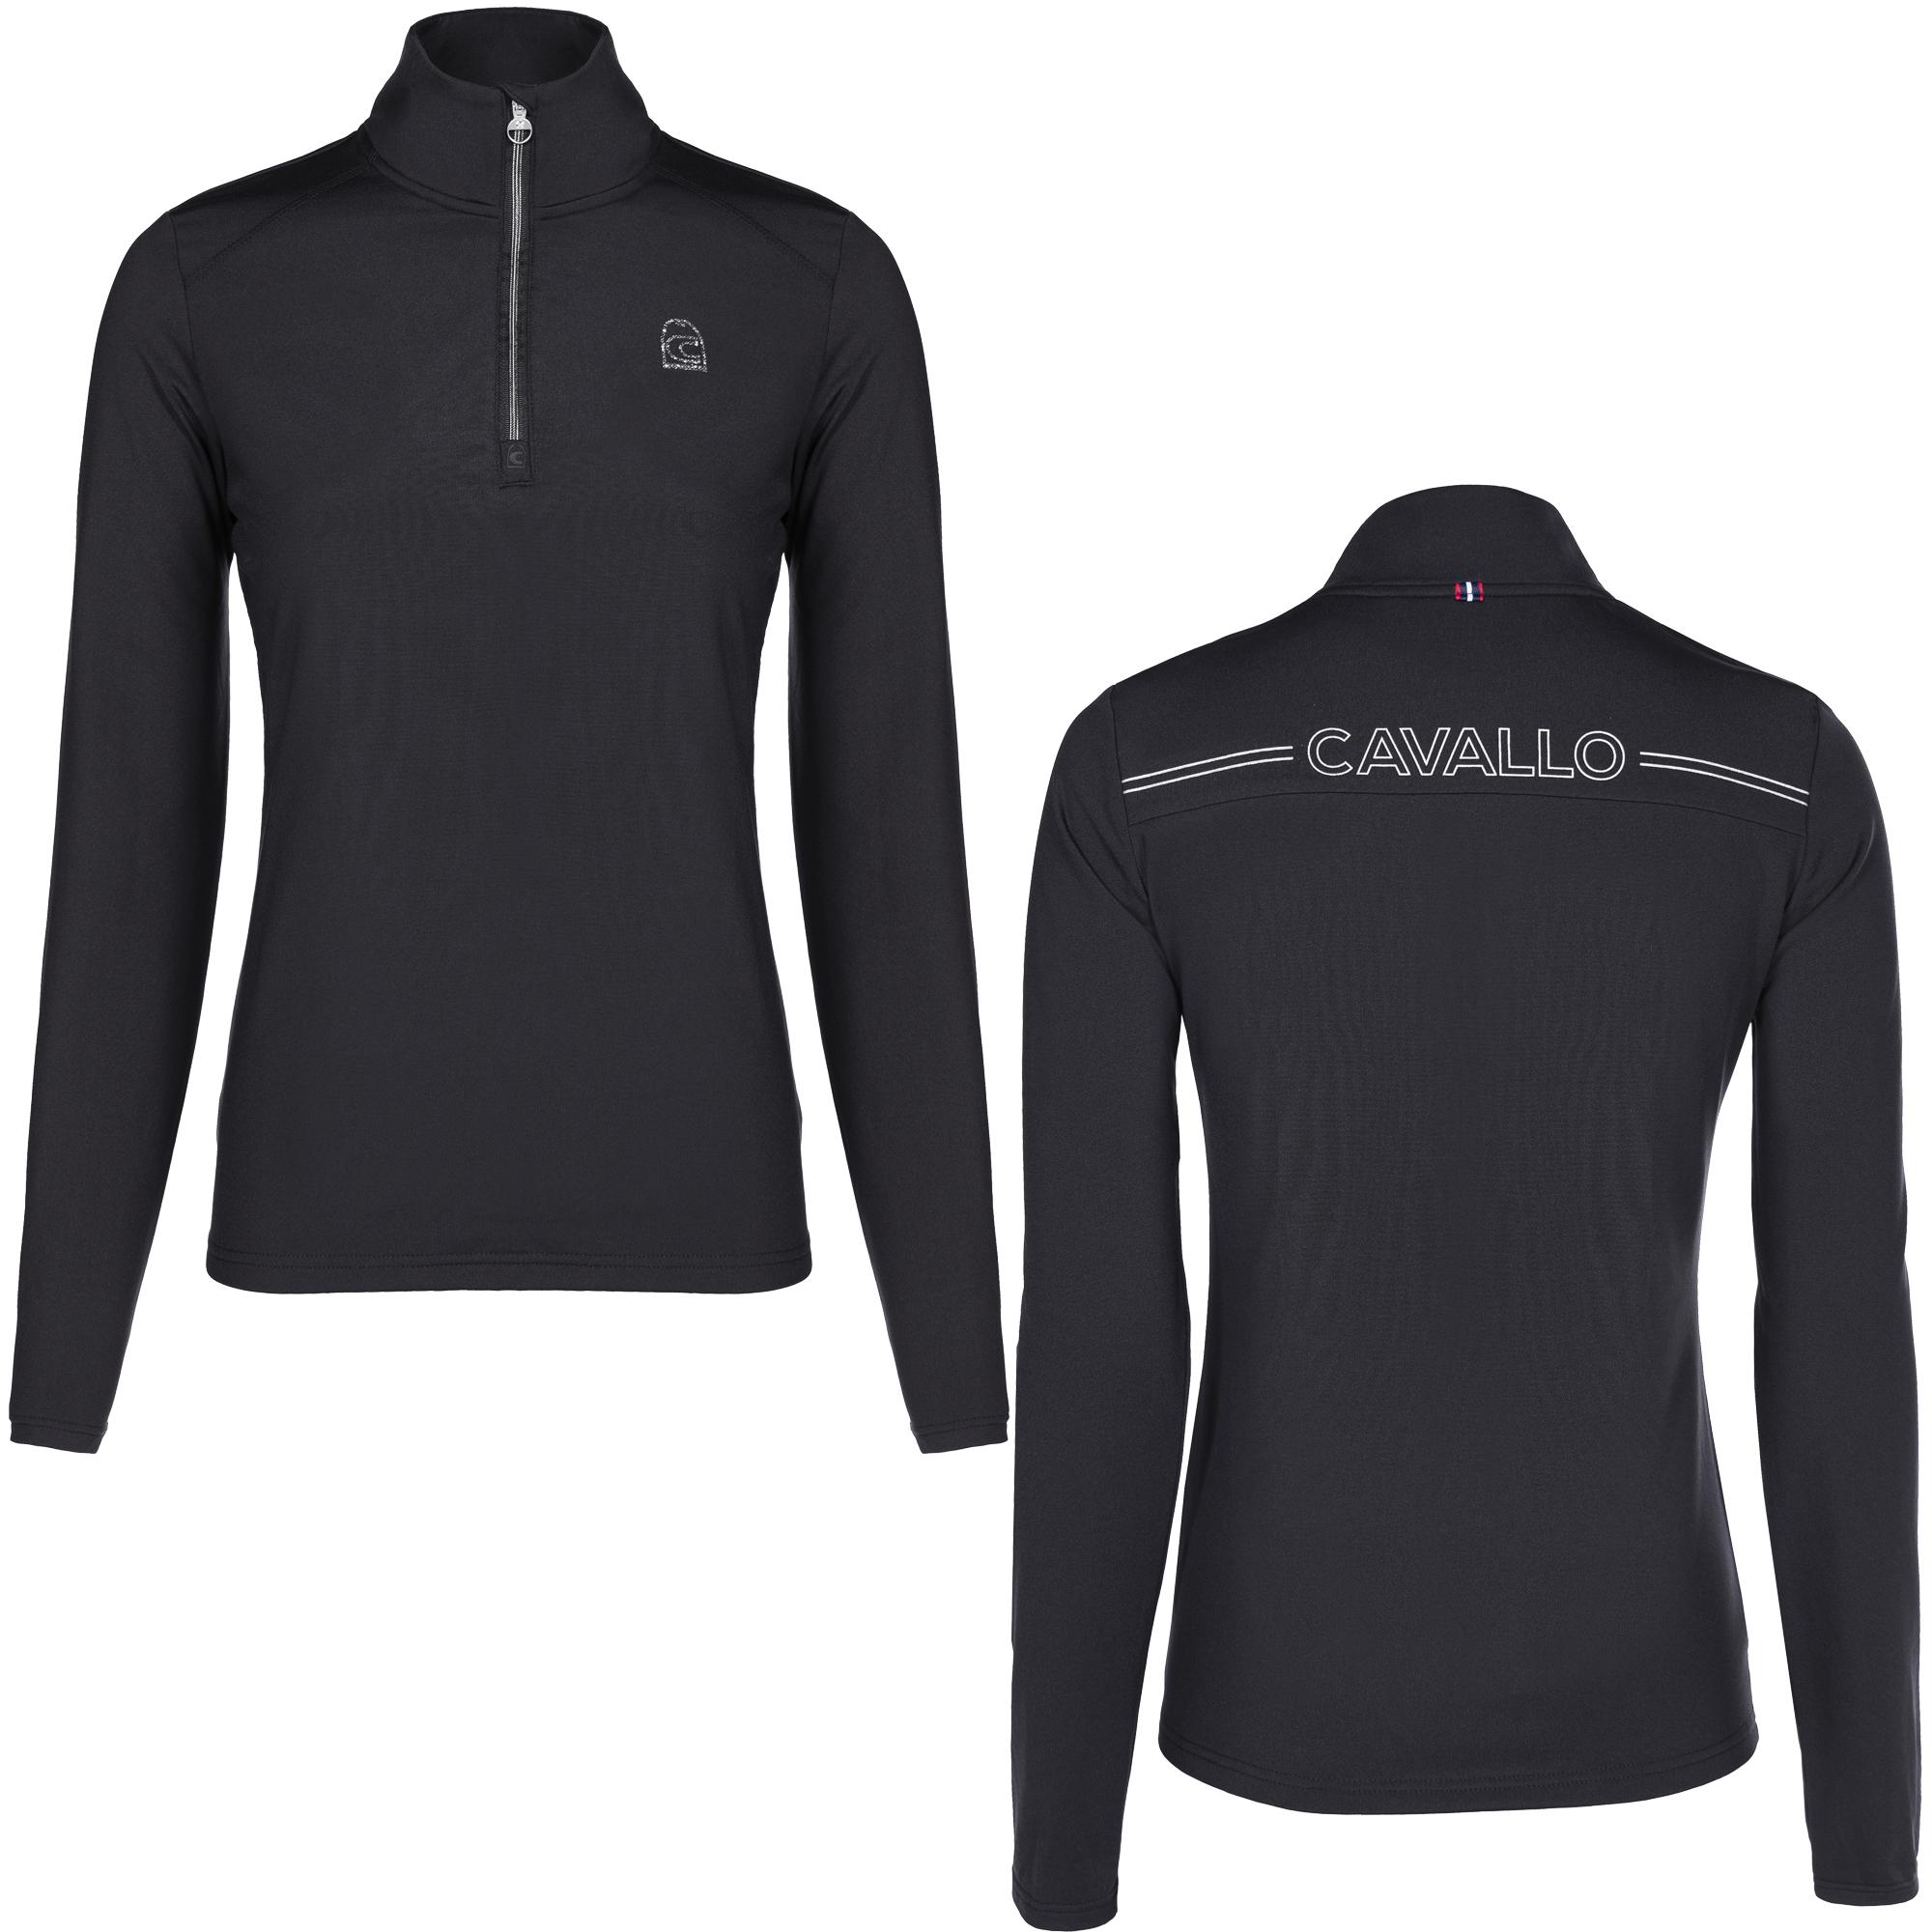 Cavallo Damen Funktions -Shirt BAIKY in black